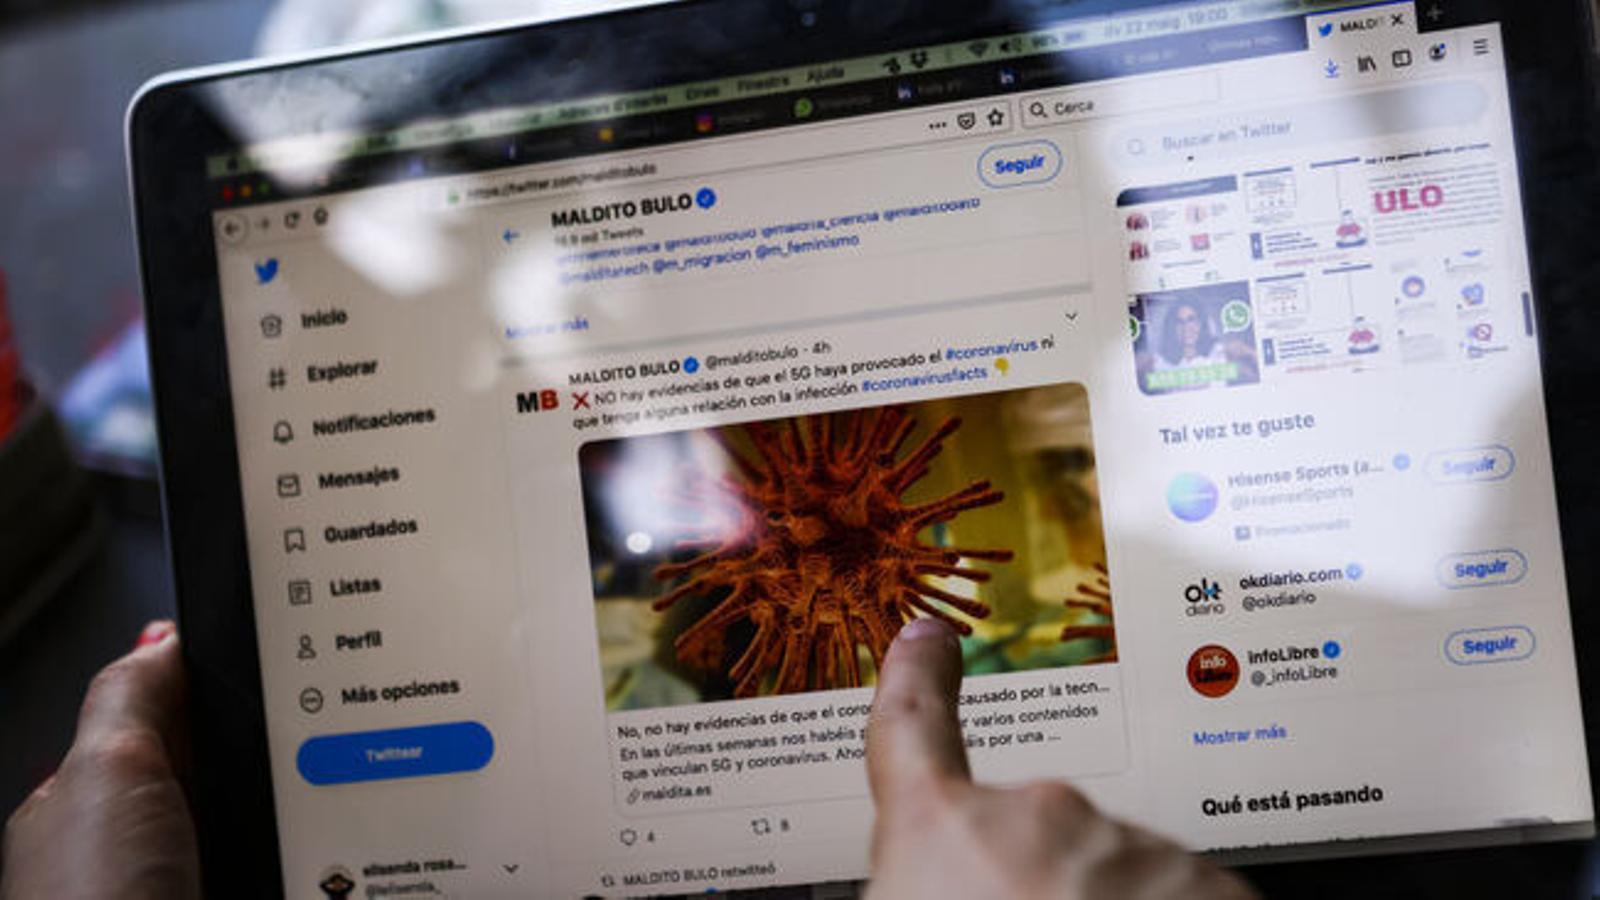 Un usuari de Twitter consultant el perfil de desmentir Fake News Maldito Bulo